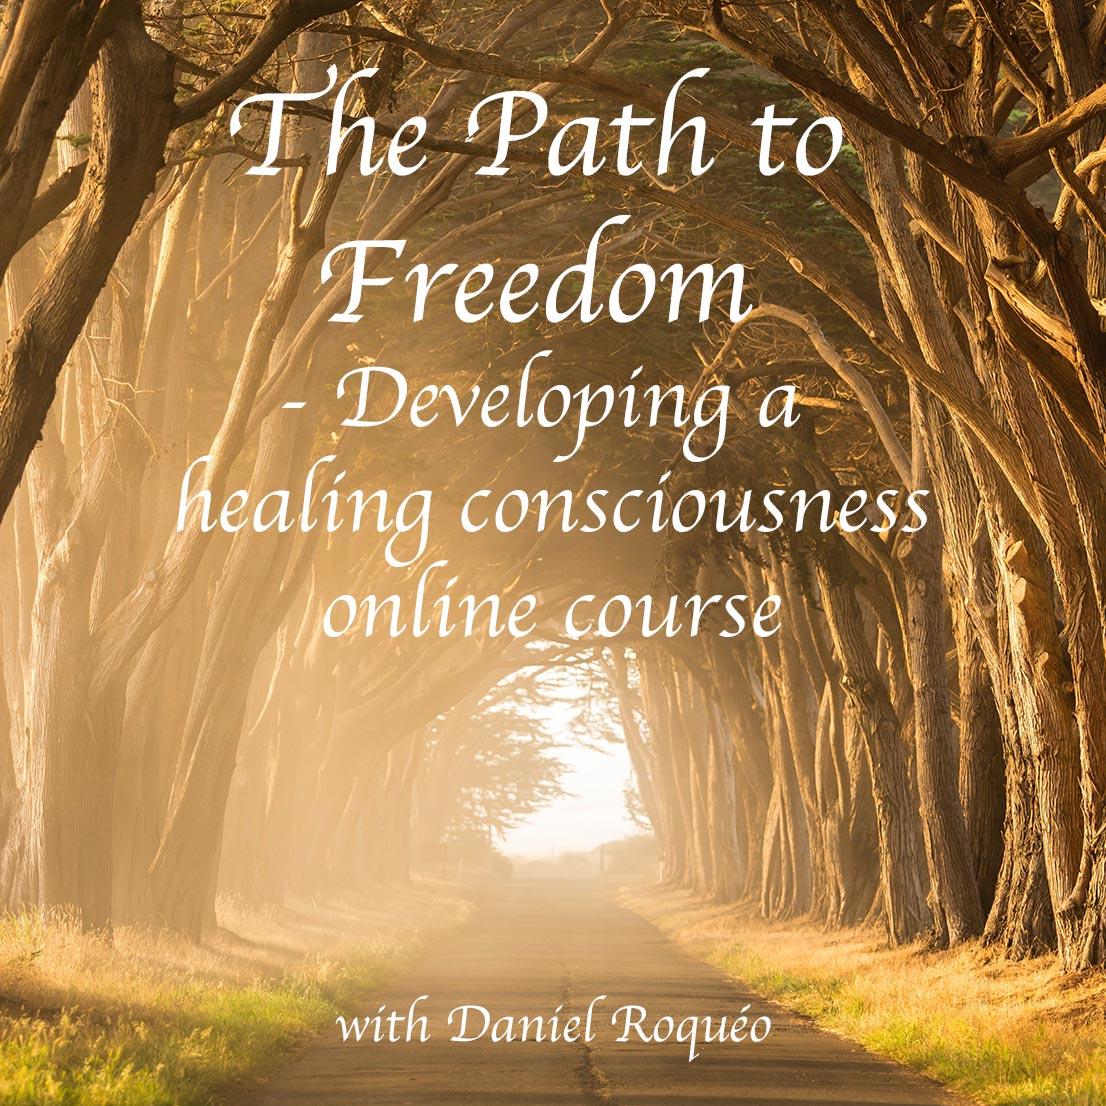 developing a healing consciousness